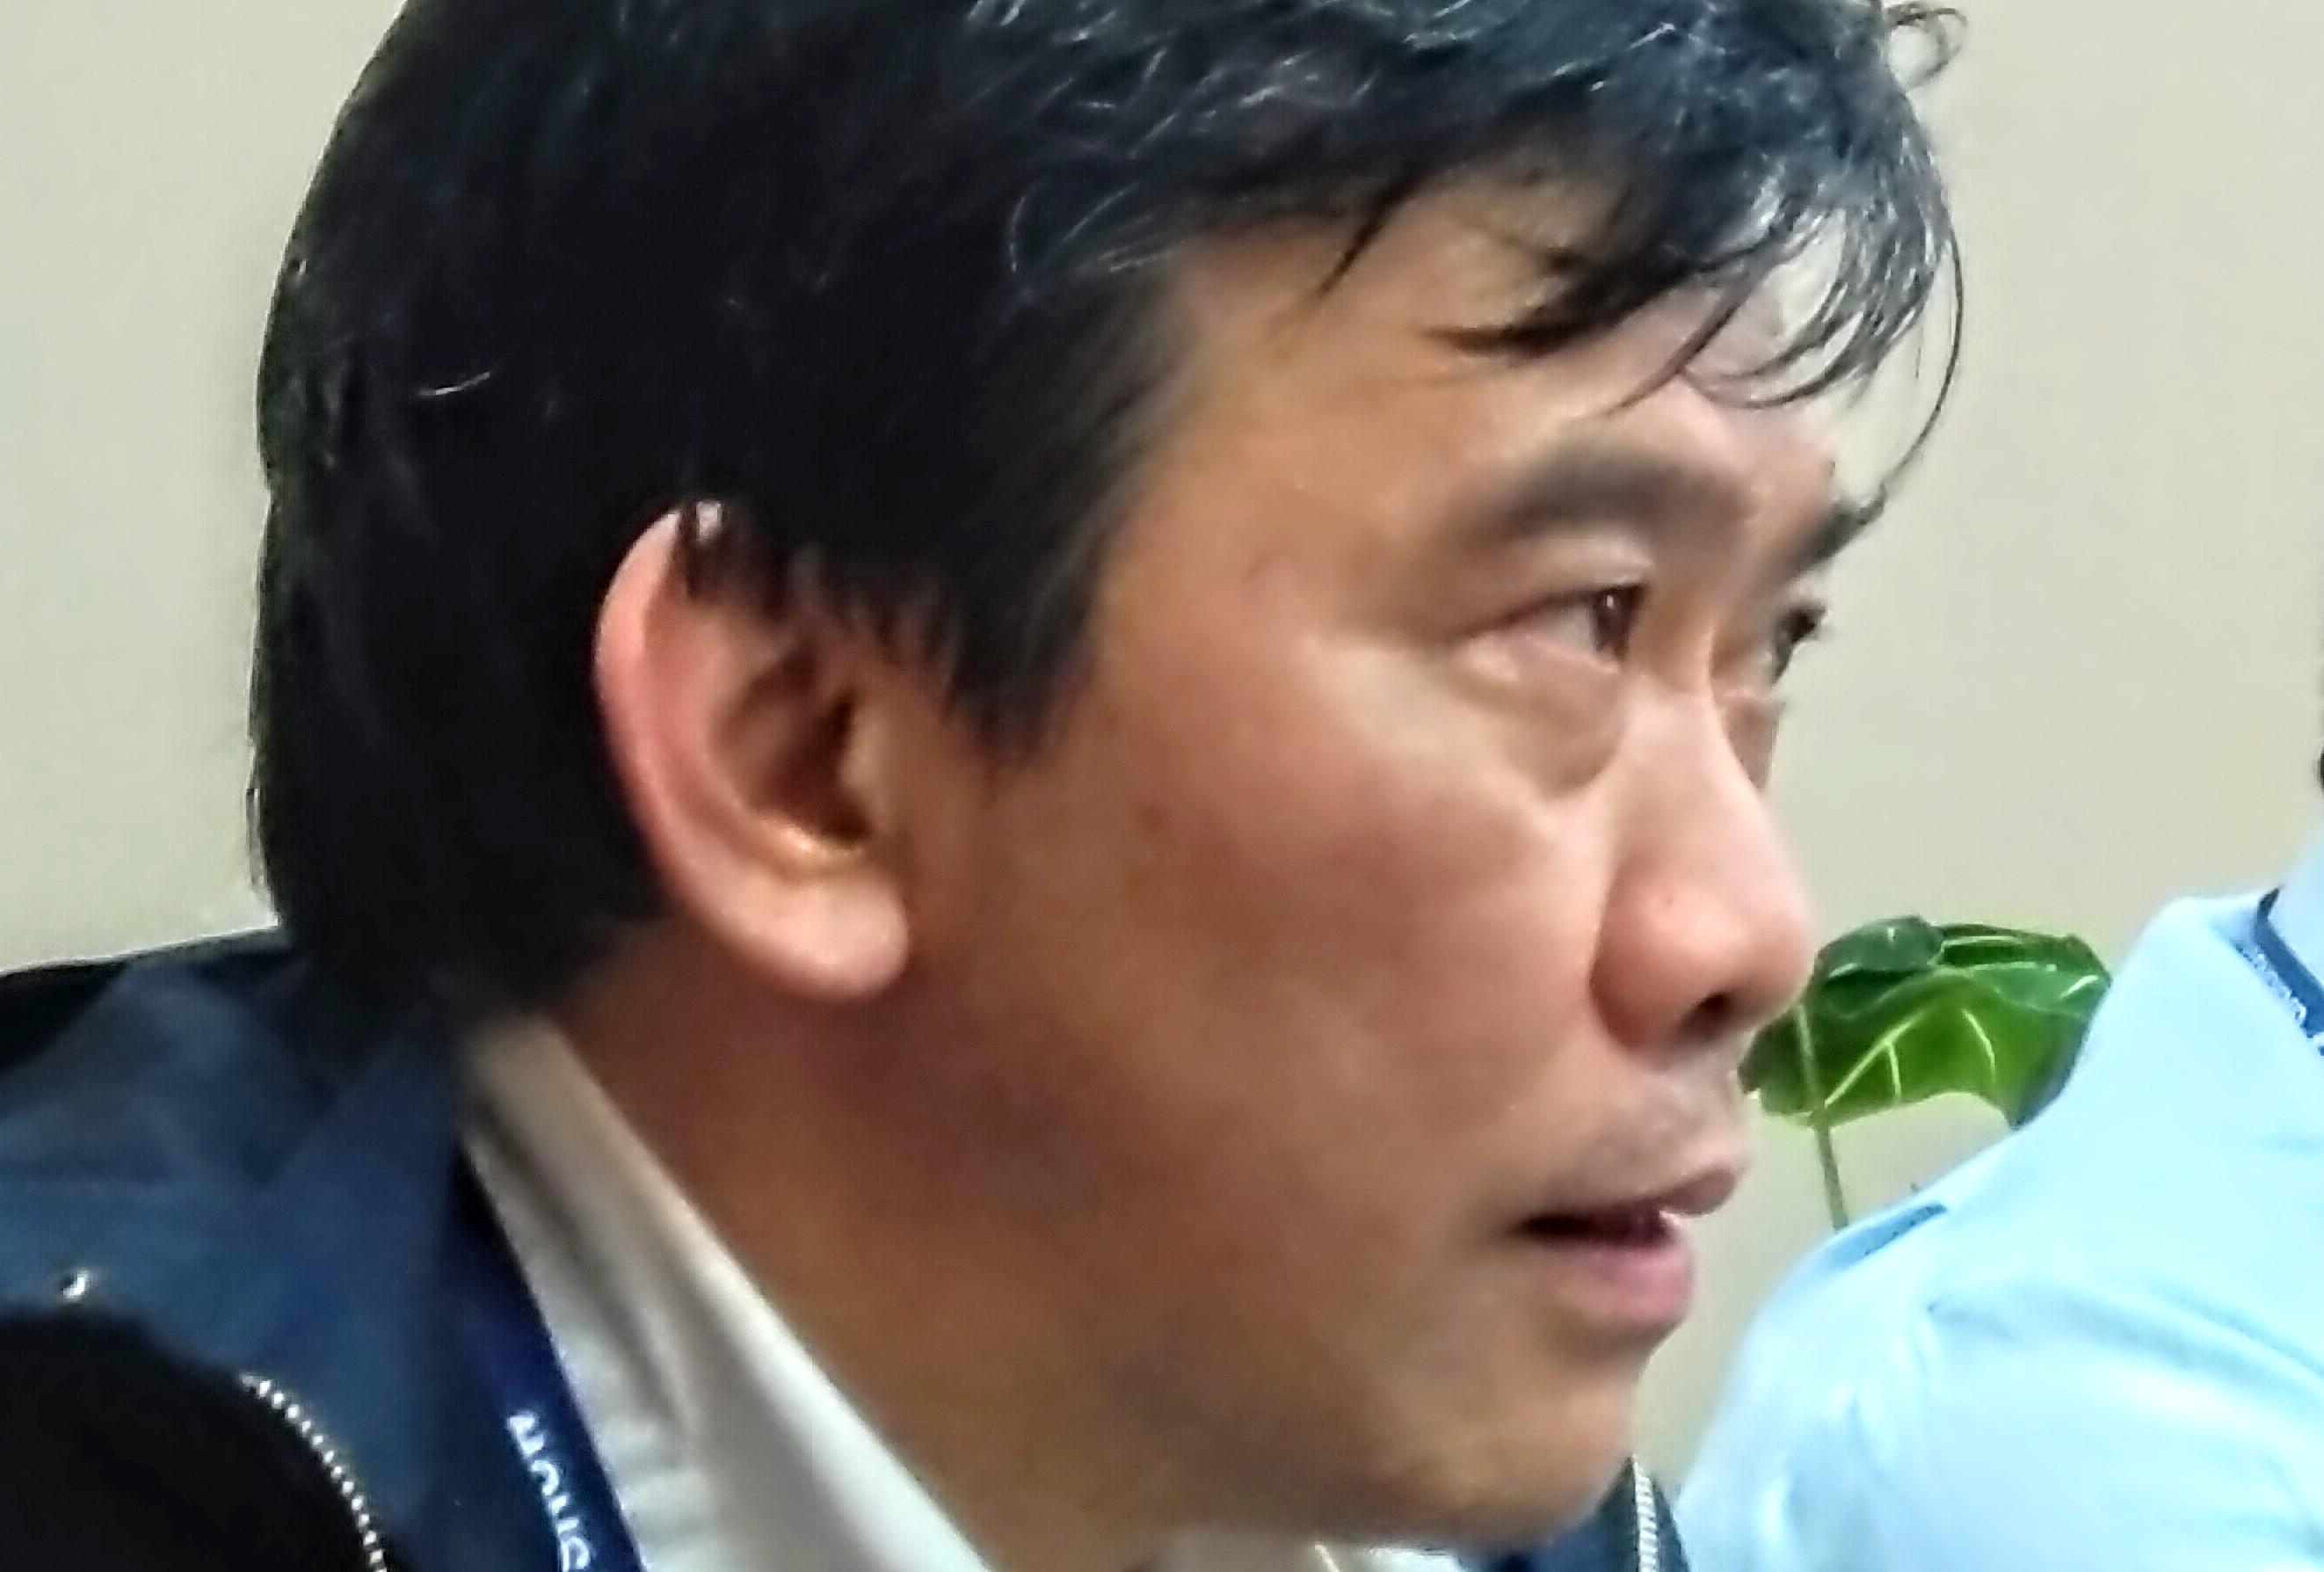 Maucash Siap Perkuat Industri Fintech Indonesia